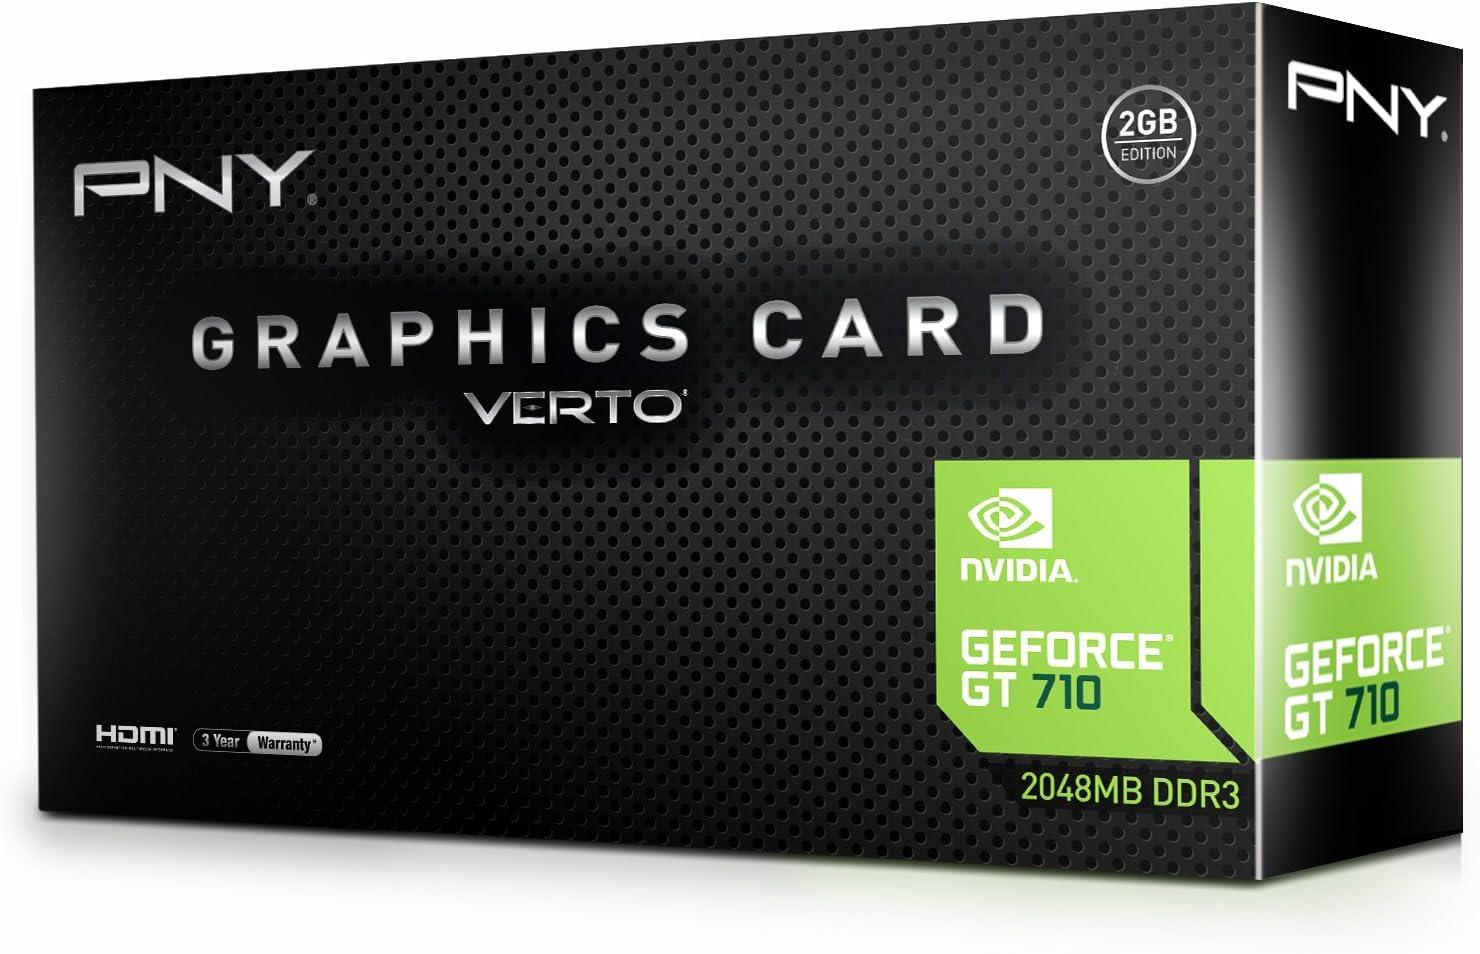 PNY NVIDIA GeForce GT 710 2GB DDR3 VGA/DVI/HDMI Low Profile PCI-Express Video Card.